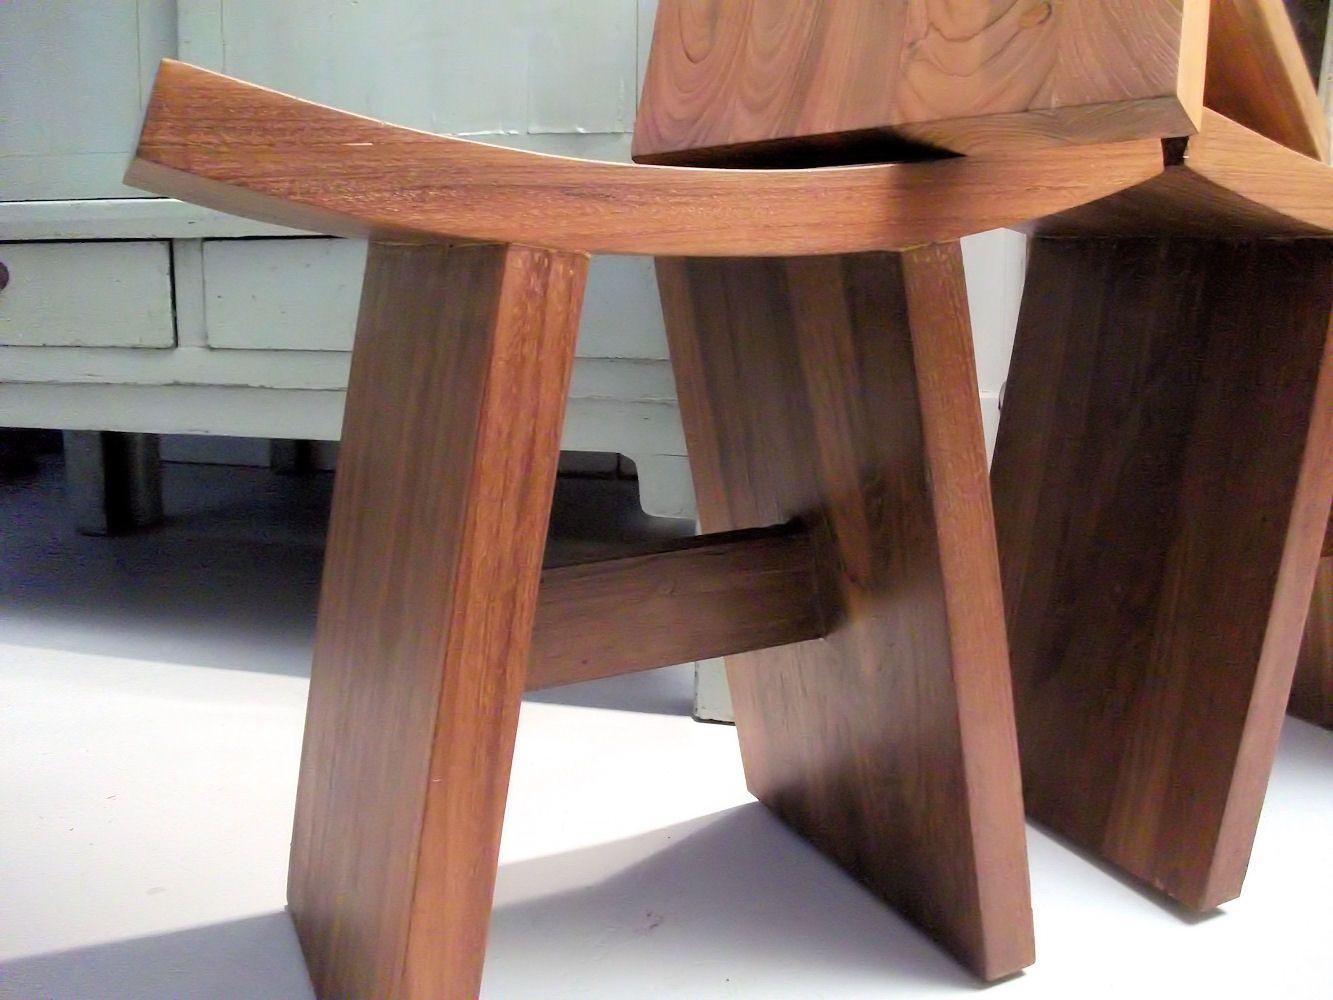 Teak Shower Stool | Furniture ideas | Pinterest | Teak shower stool ...